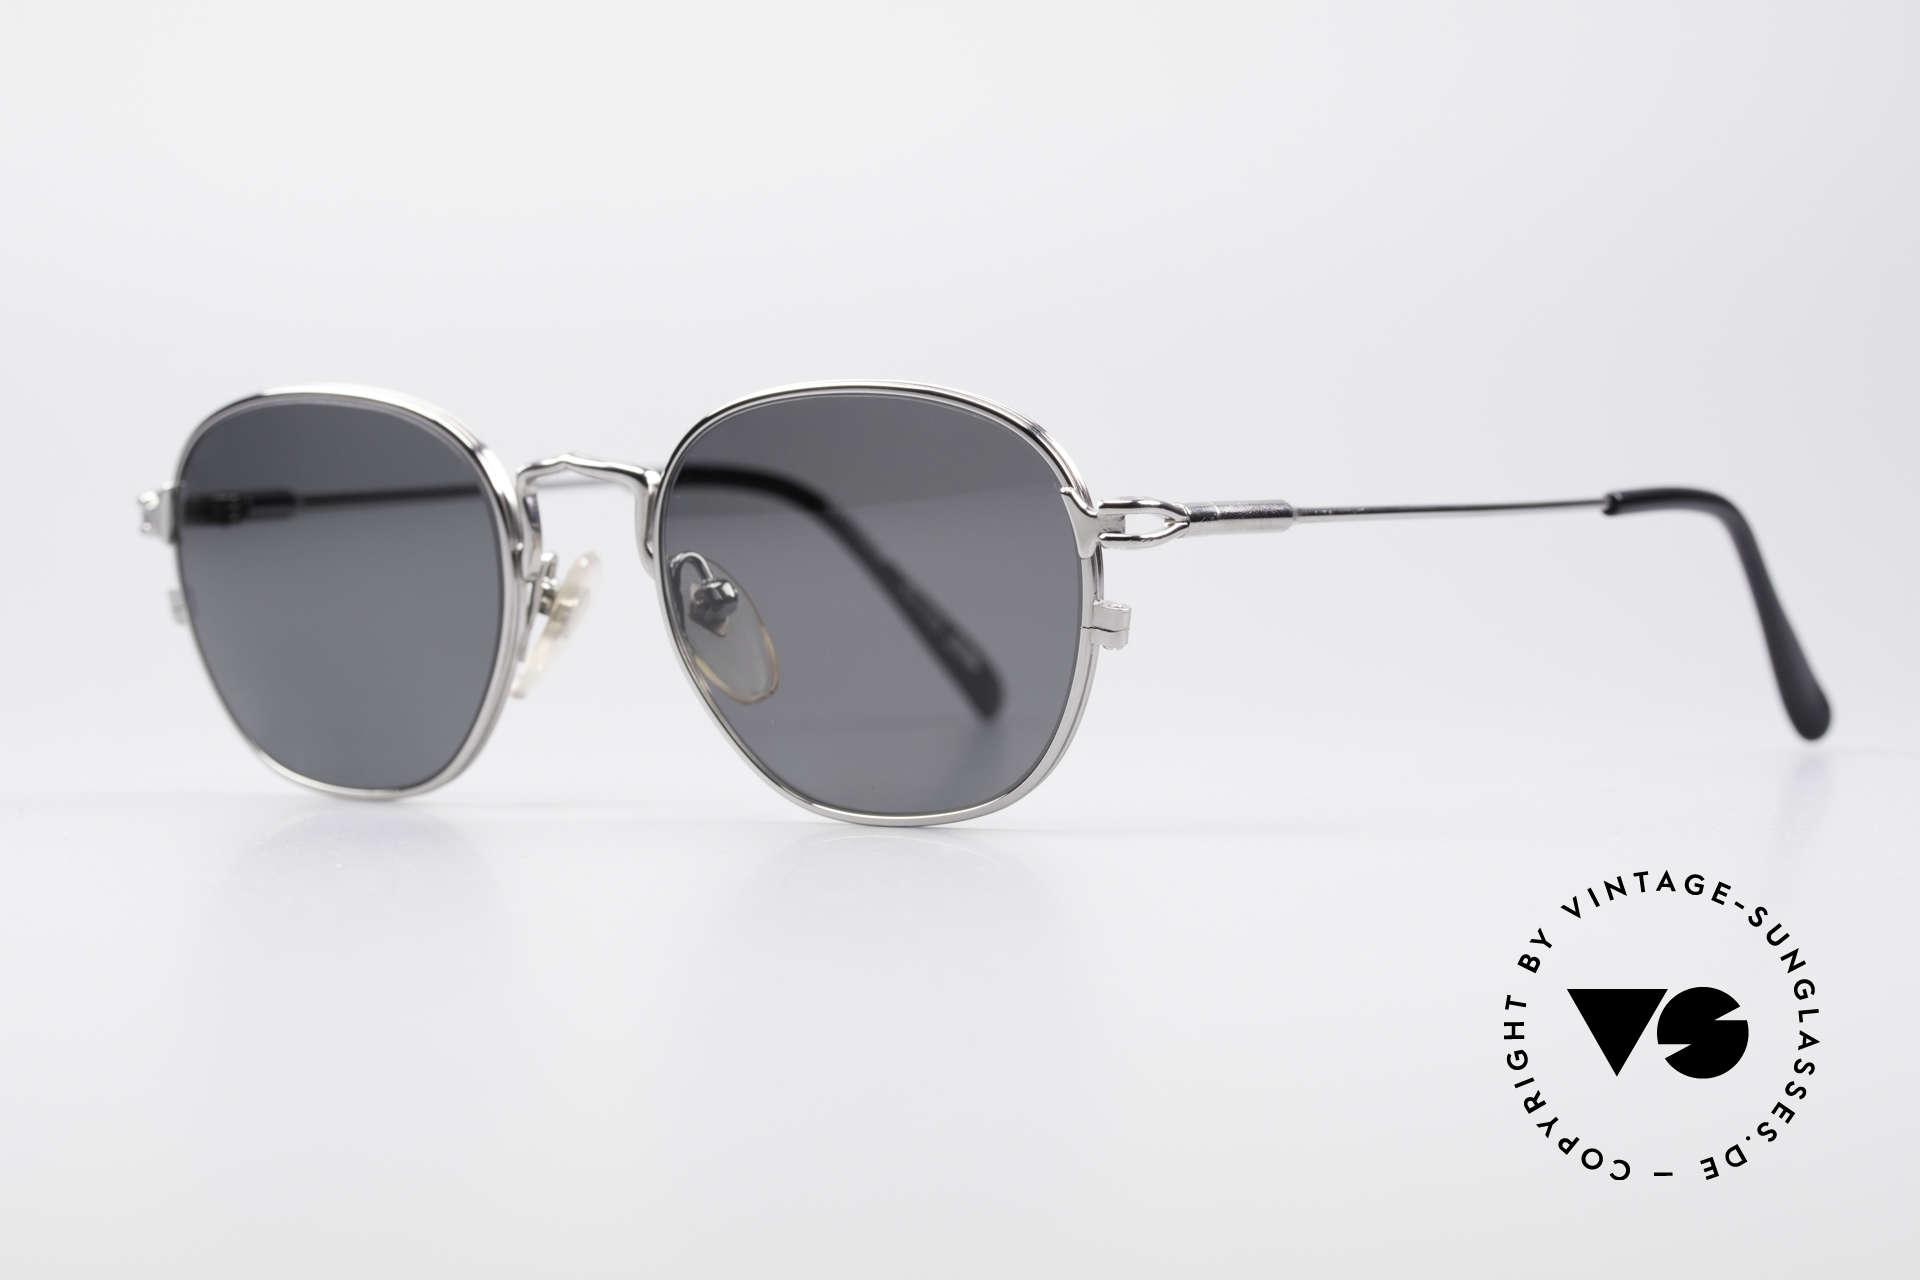 Jean Paul Gaultier 55-3182 Titanium Frame Polarized, silver chrome plated frame finish + polarized sun lenses, Made for Men and Women